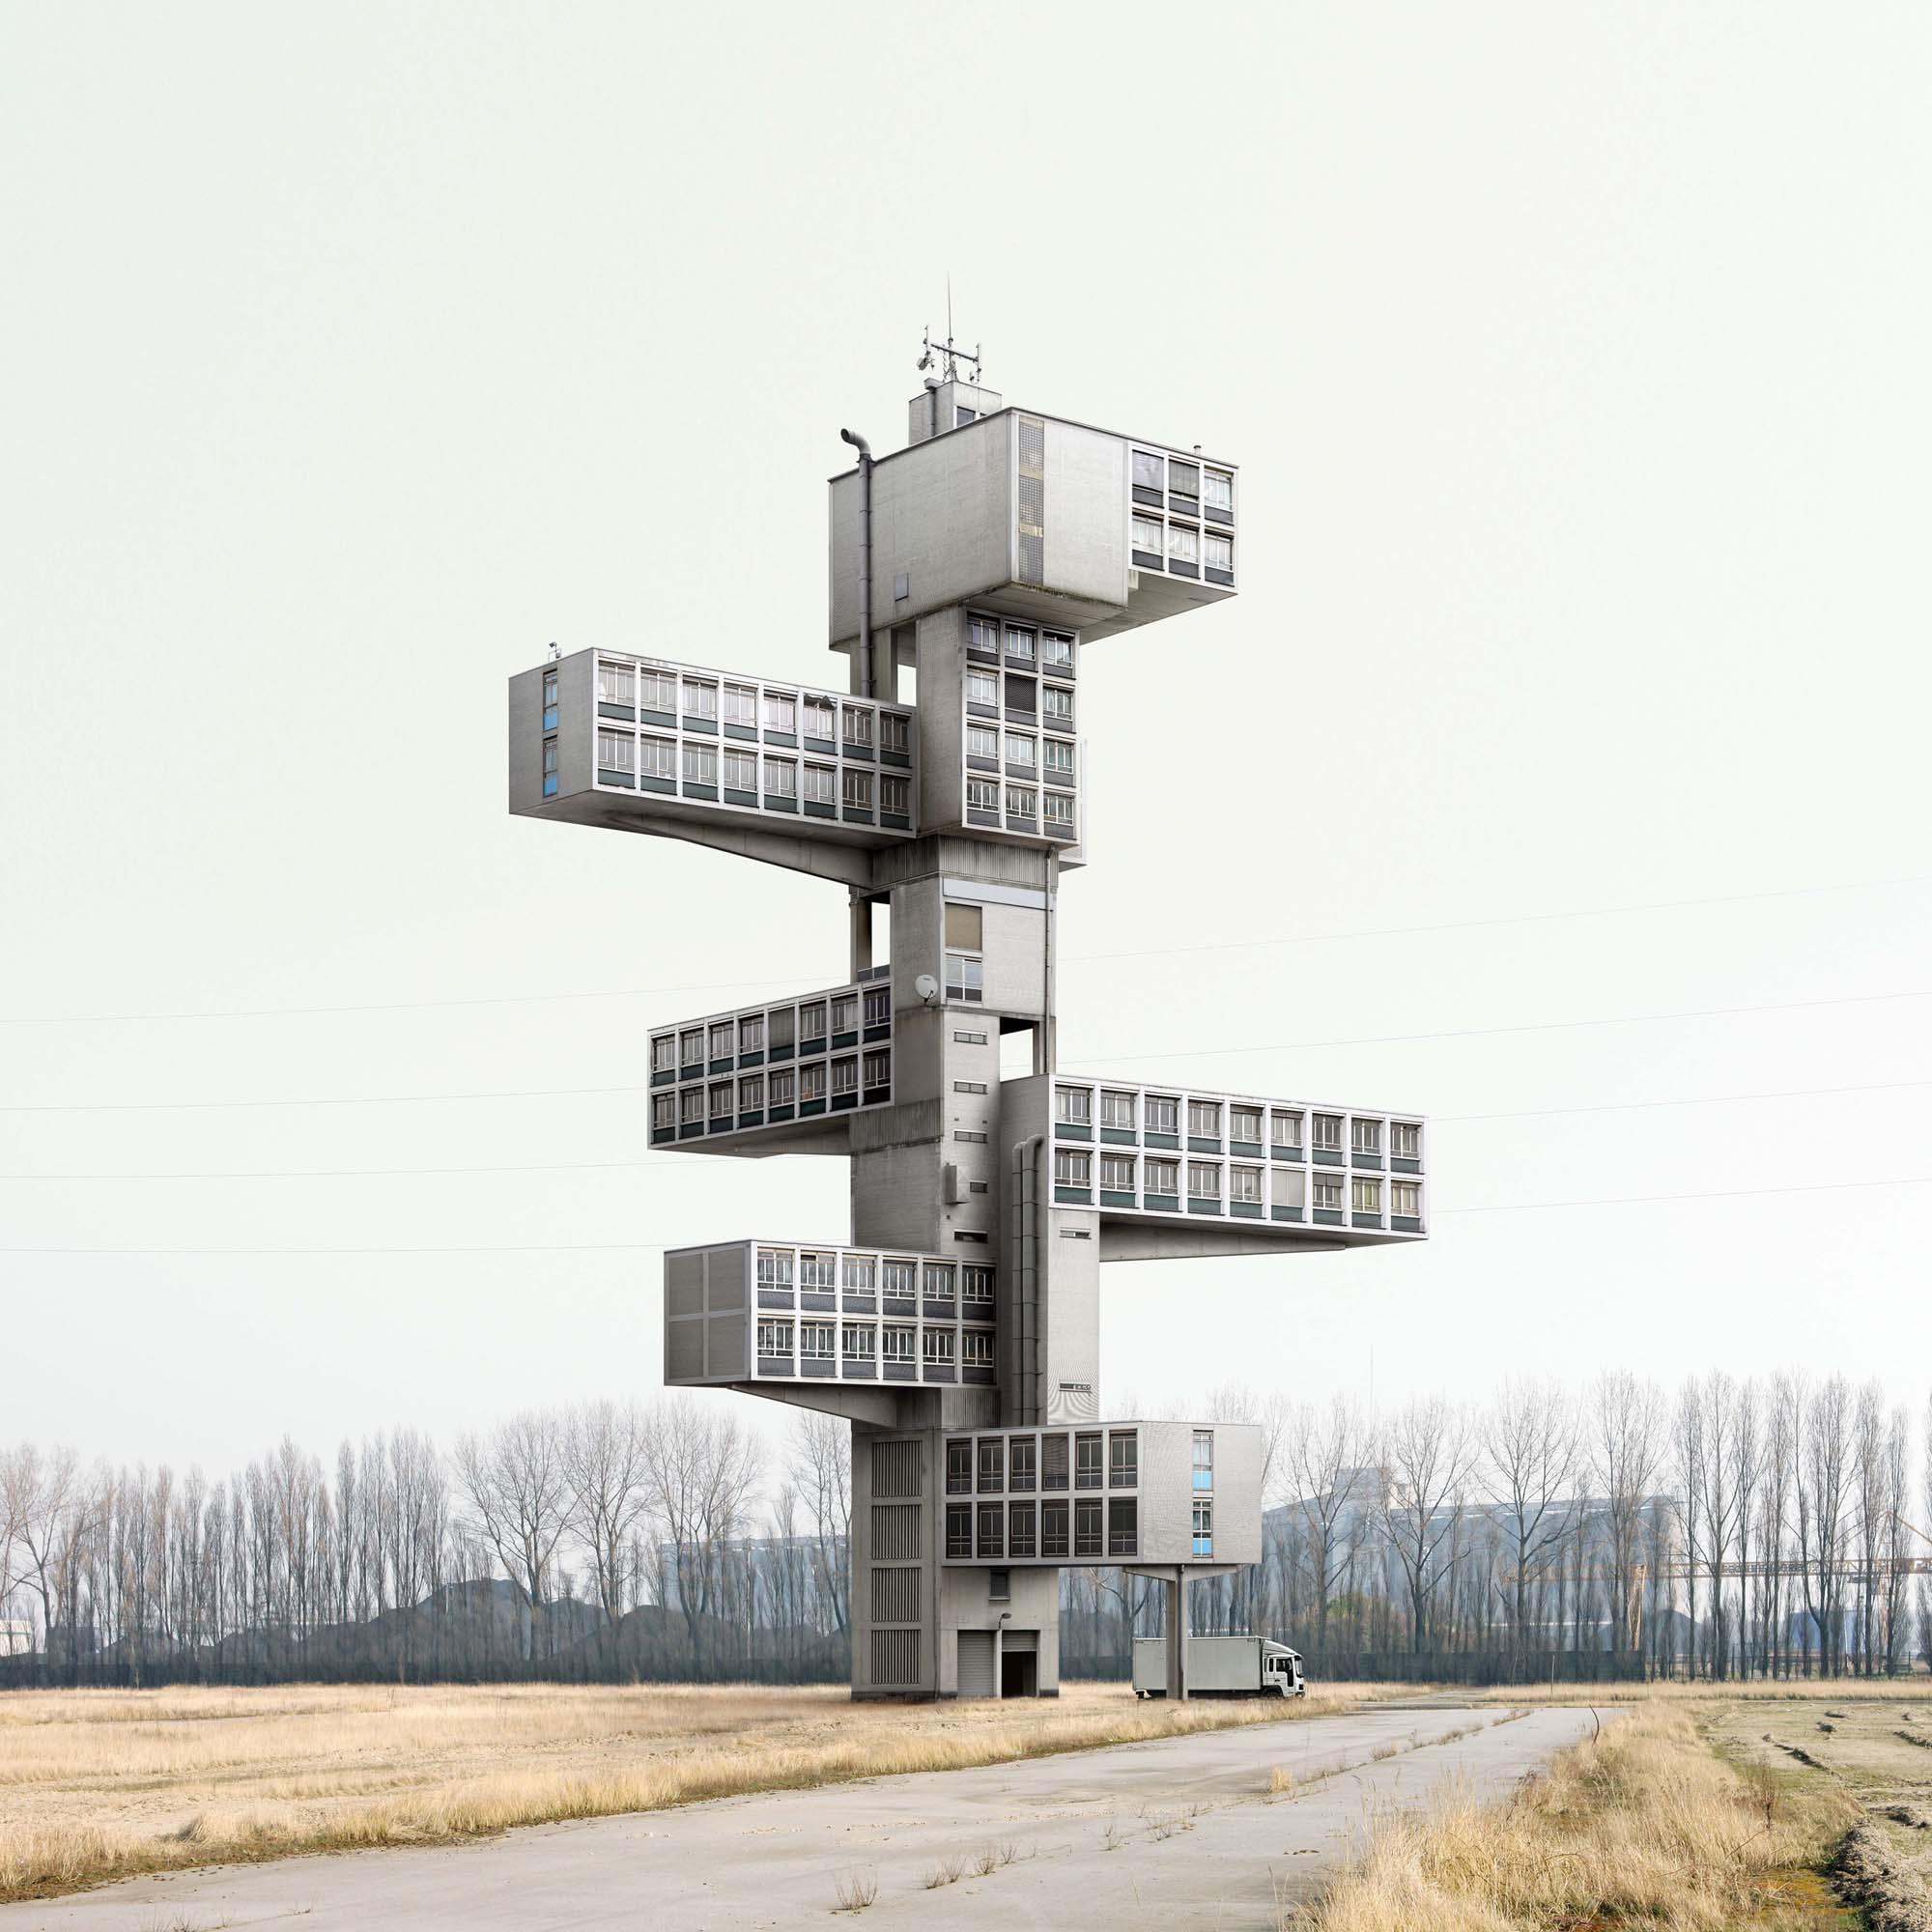 Architecture.Exterior cover image